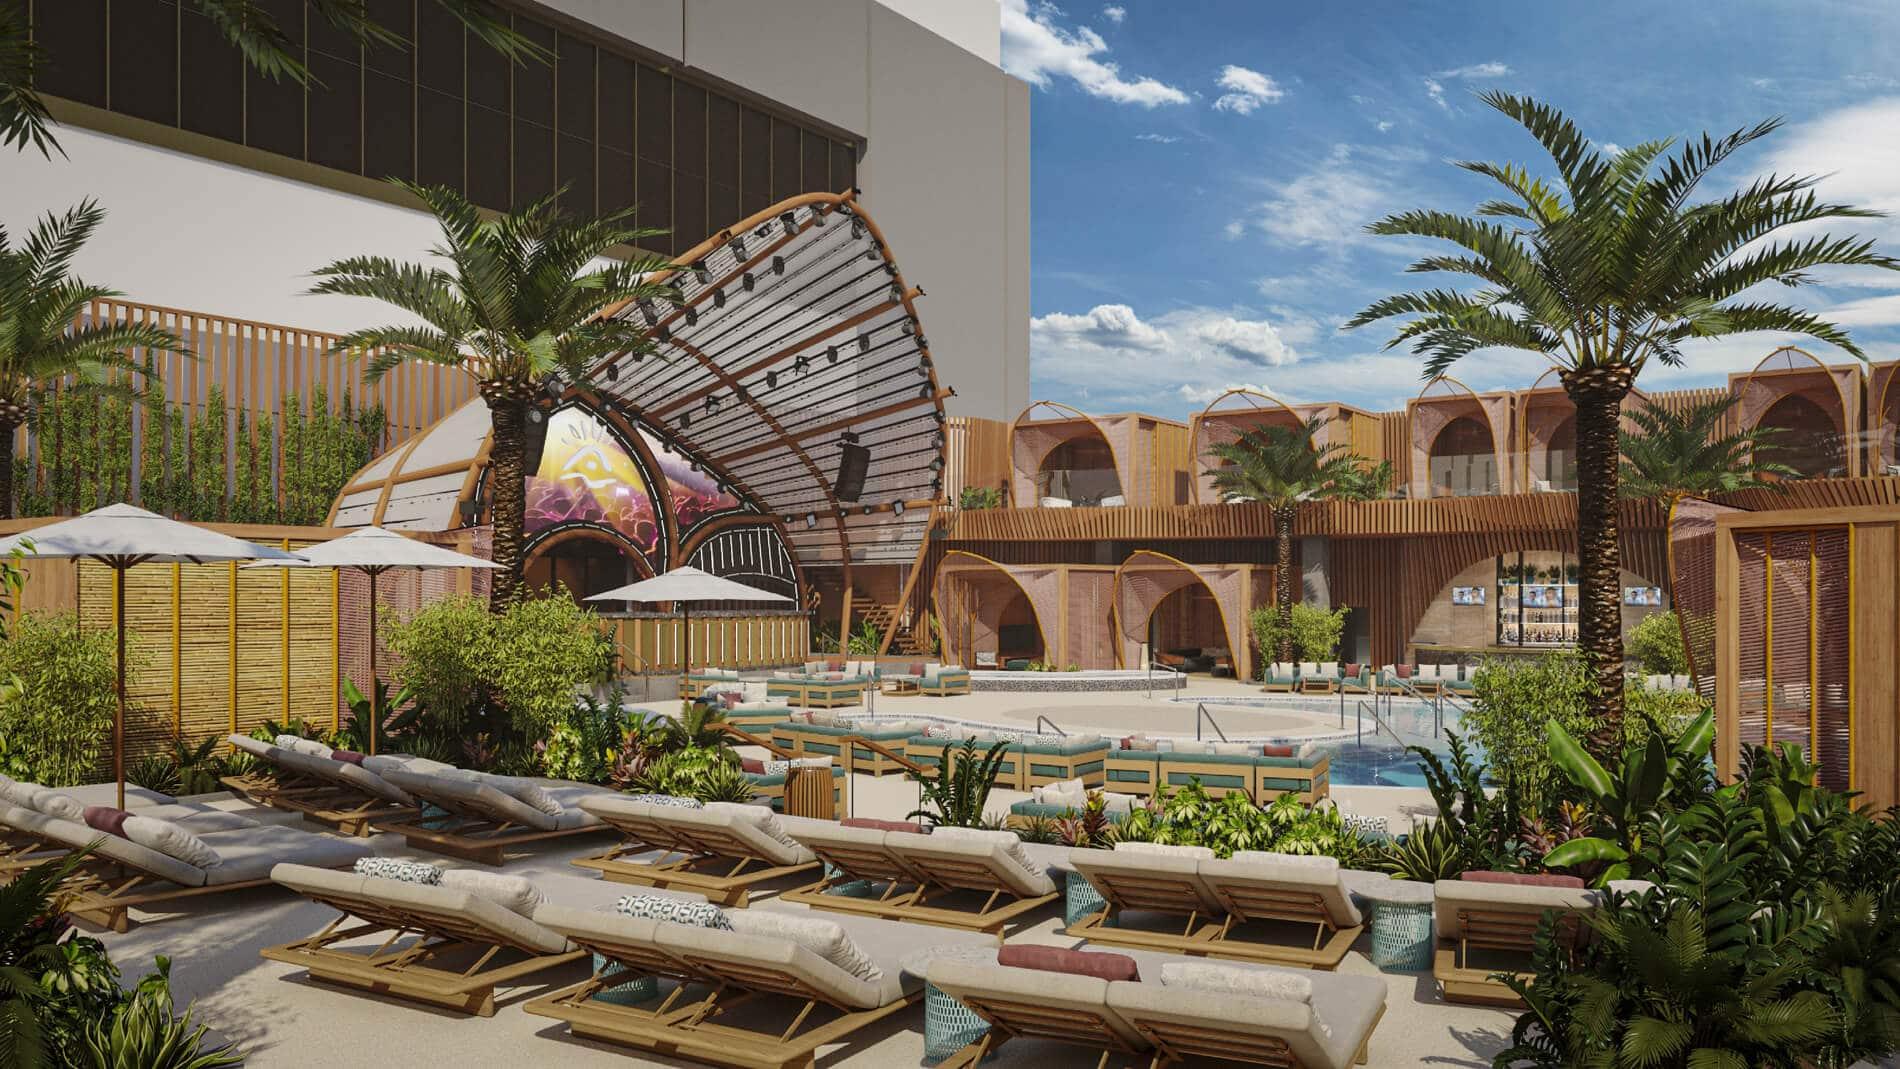 pool party ayu dayclub stage at resorts world las vegas